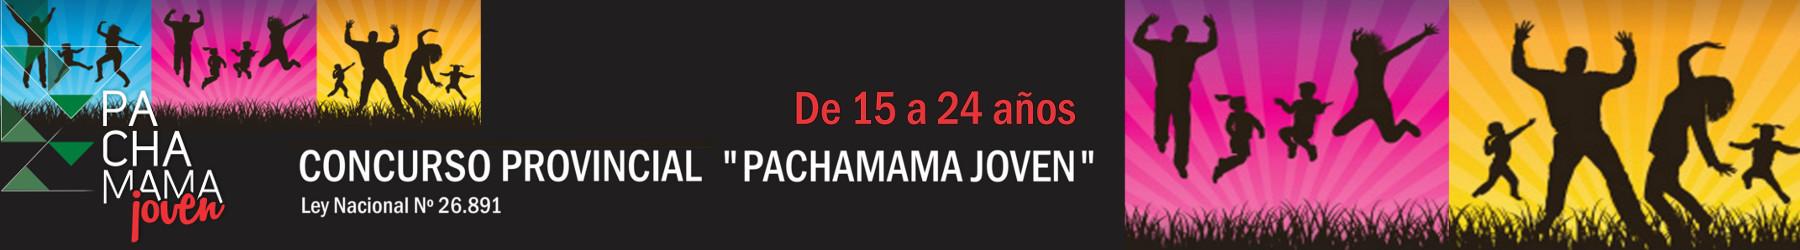 portada-web-pachamama